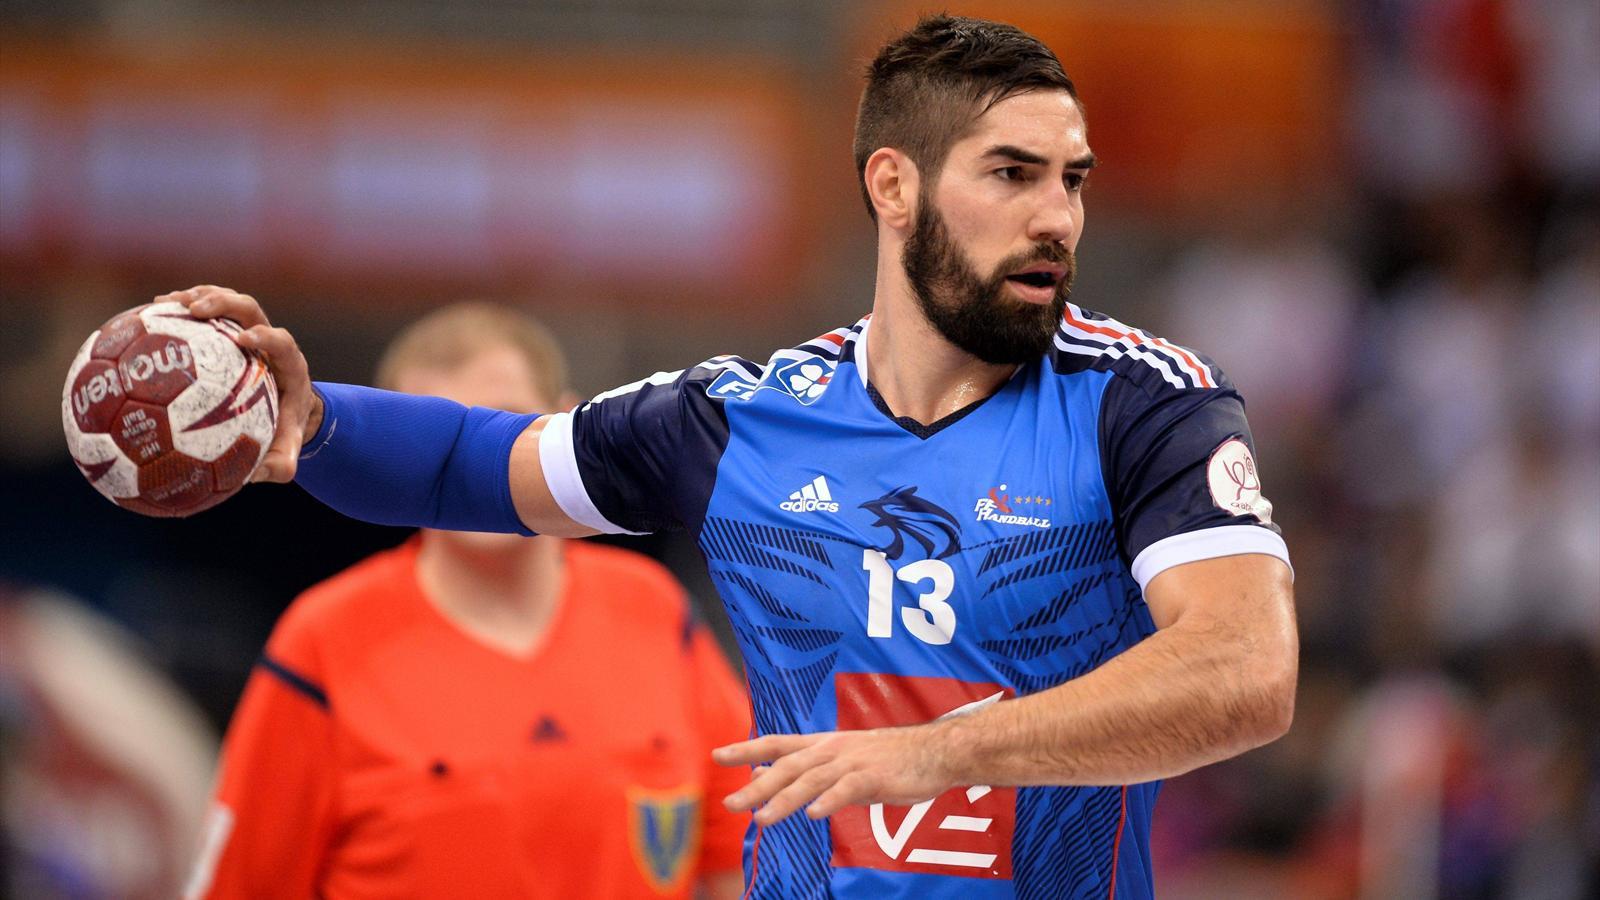 Mondial 2015 equipe de france nikola karabatic devrait - Programme coupe du monde de handball 2015 ...